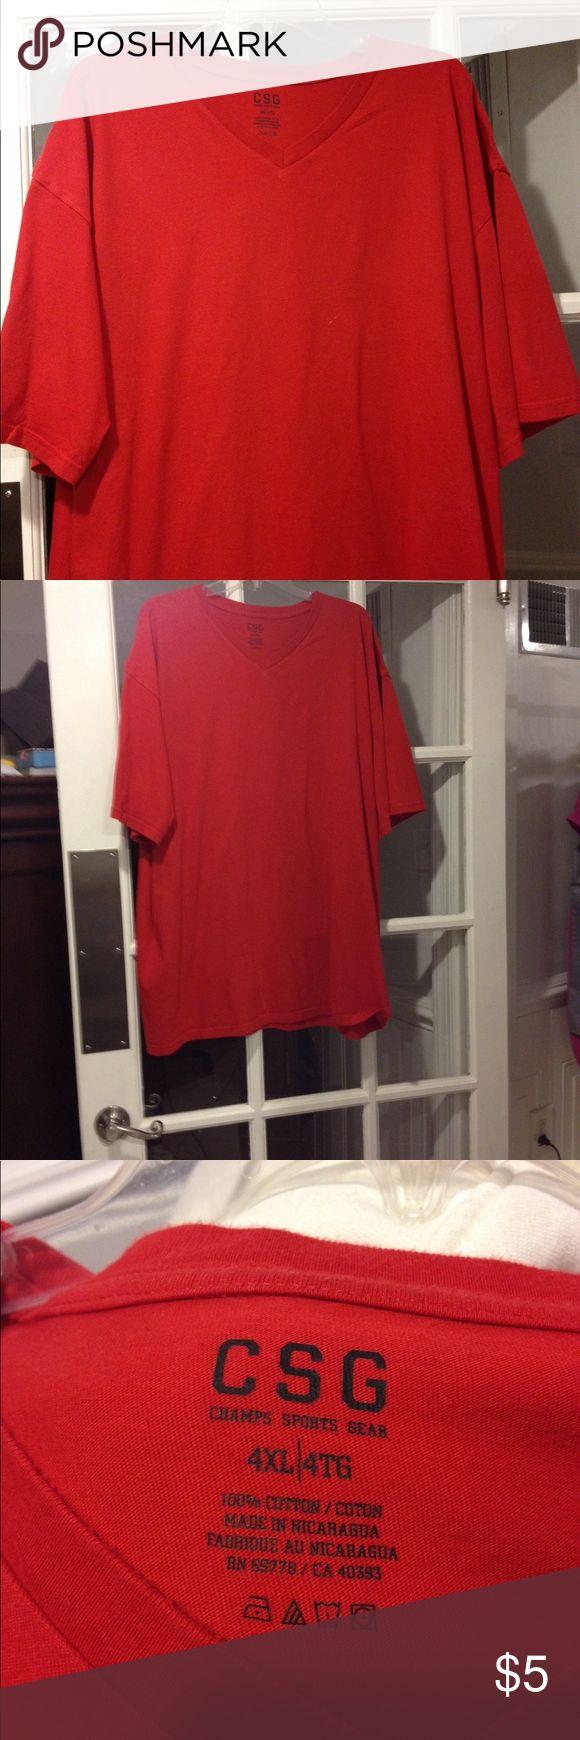 CSG 4XL Tshirt good condition Size 4XL Champs Sports Gear Tshirt good condition Champs Sports Gear Shirts Tees - Short Sleeve